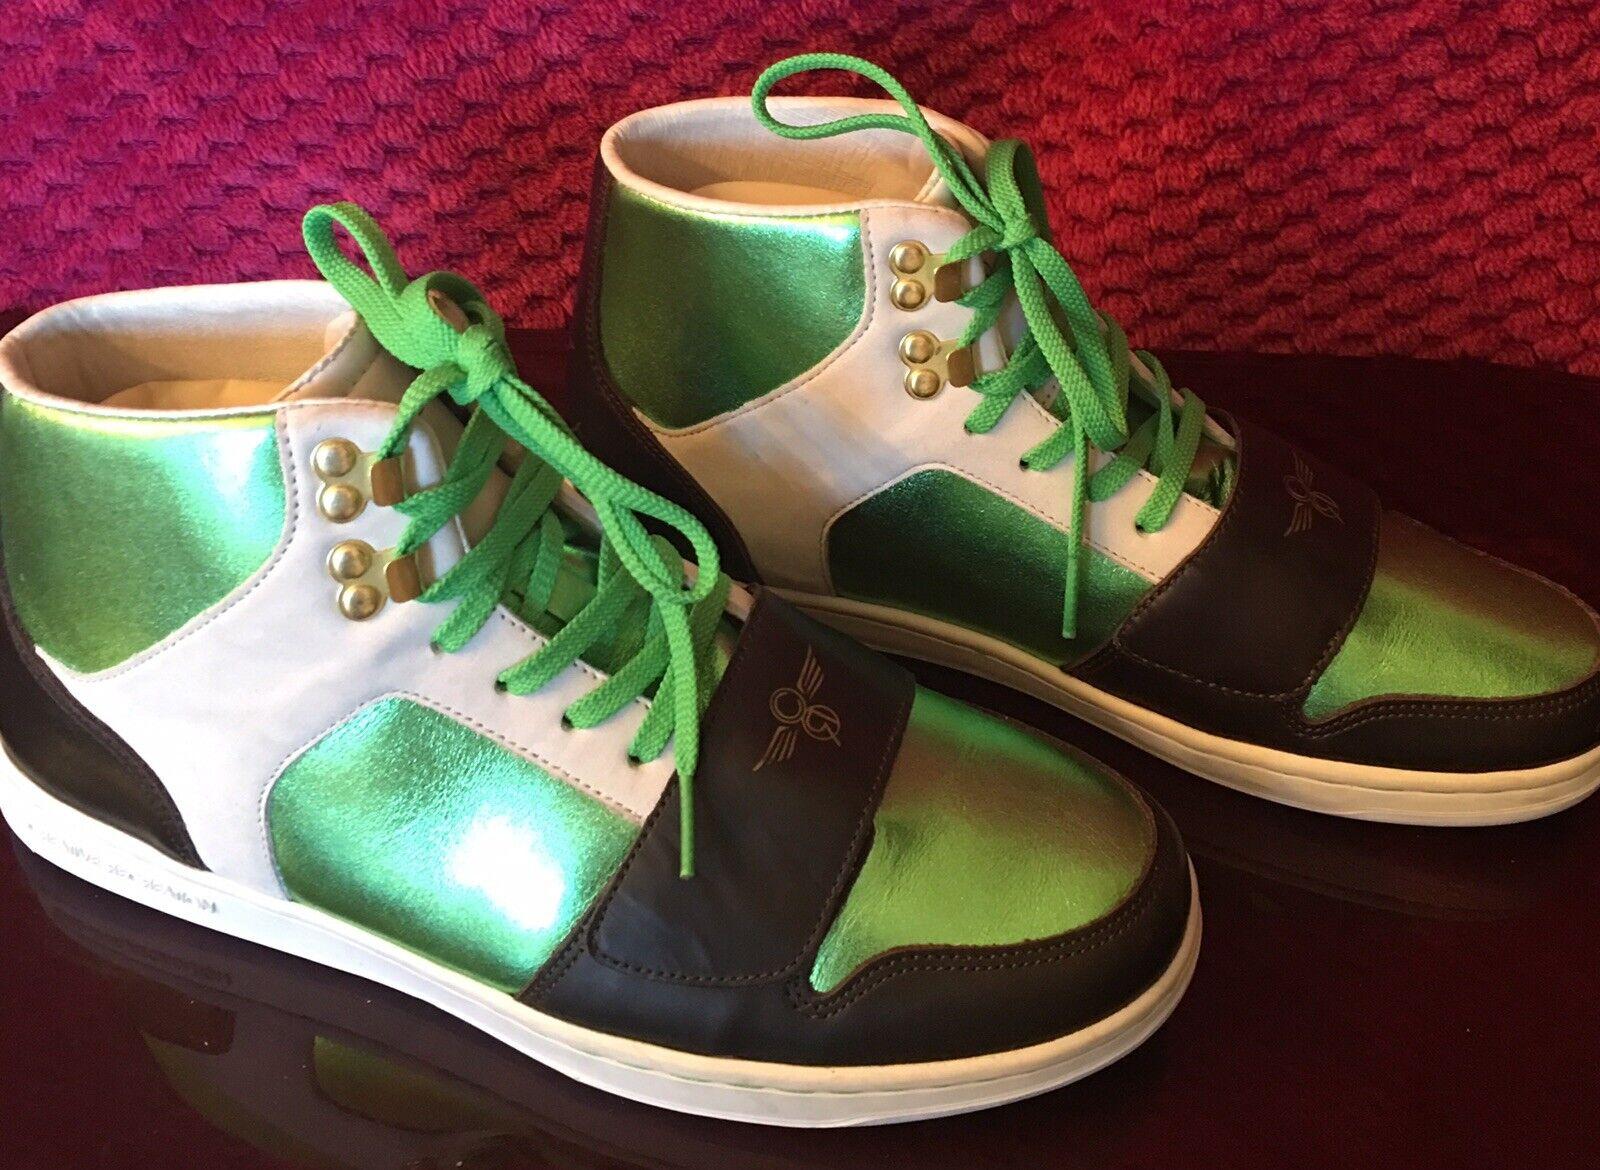 Creative Recreation Chaussures Hommes Cesario paniers montantes Taille 9 vert noir